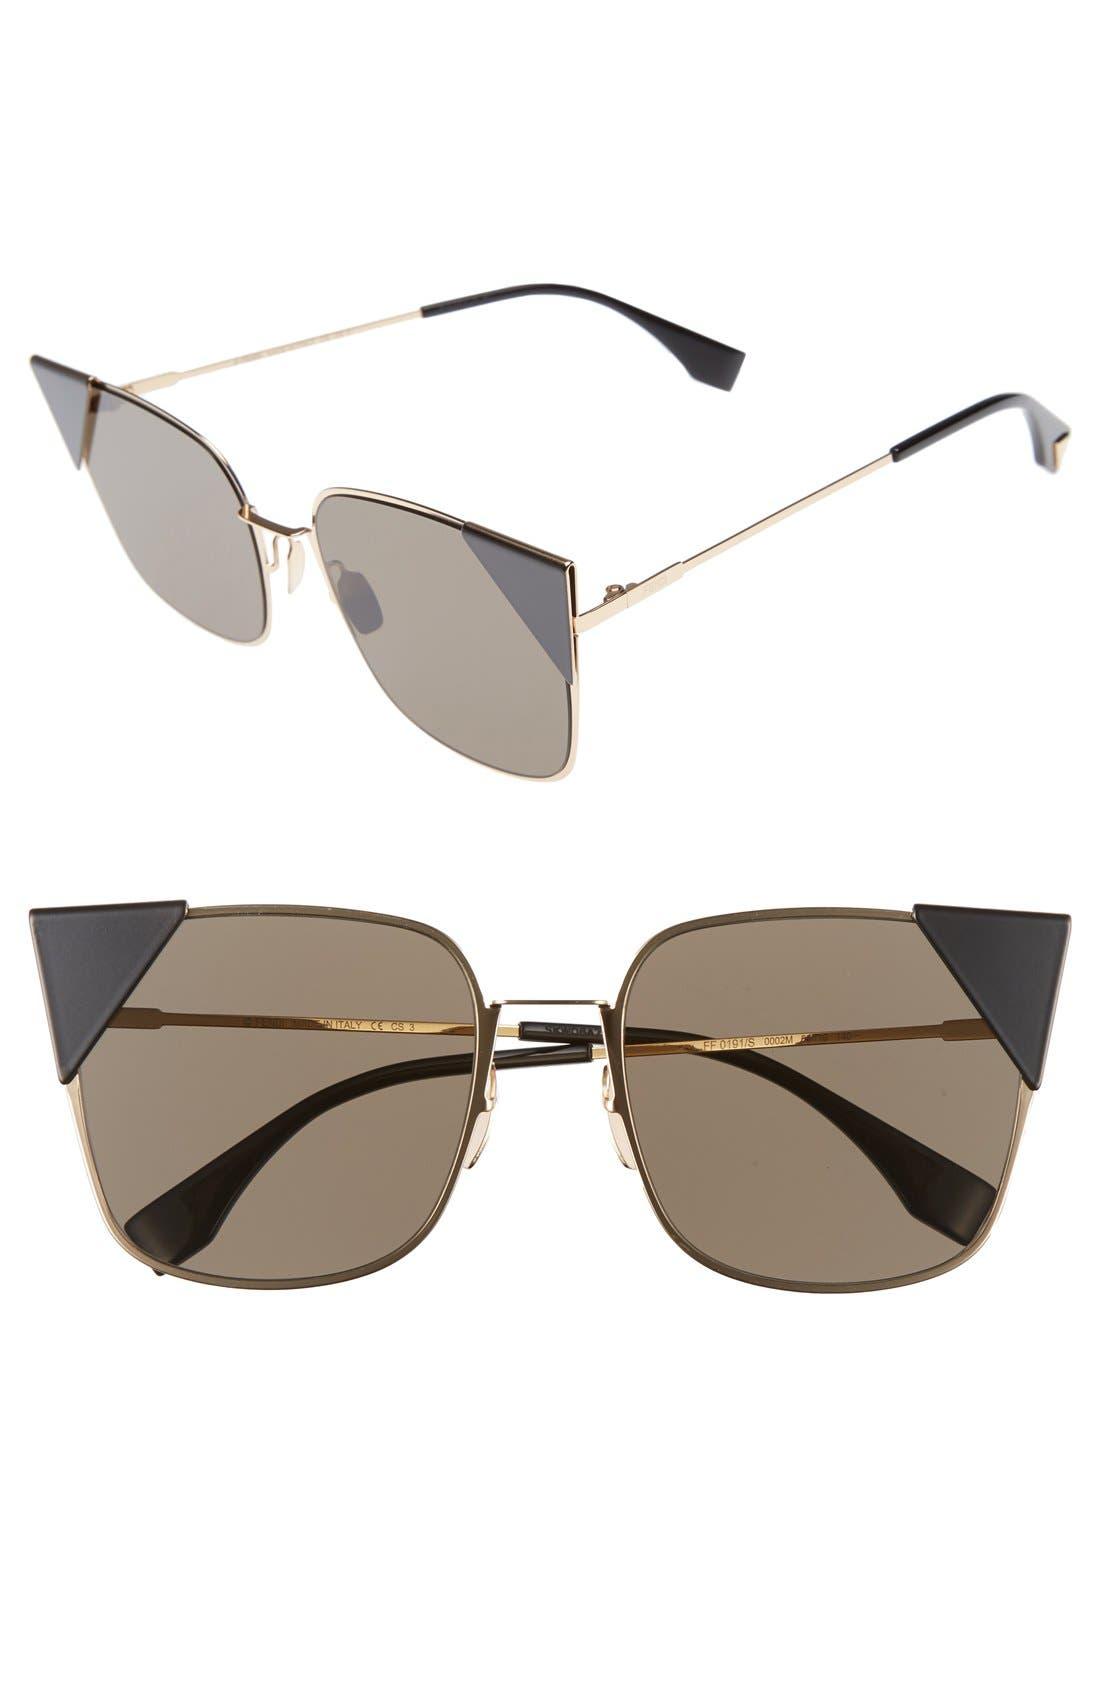 Alternate Image 1 Selected - Fendi 55mm Tipped Cat Eye Sunglasses